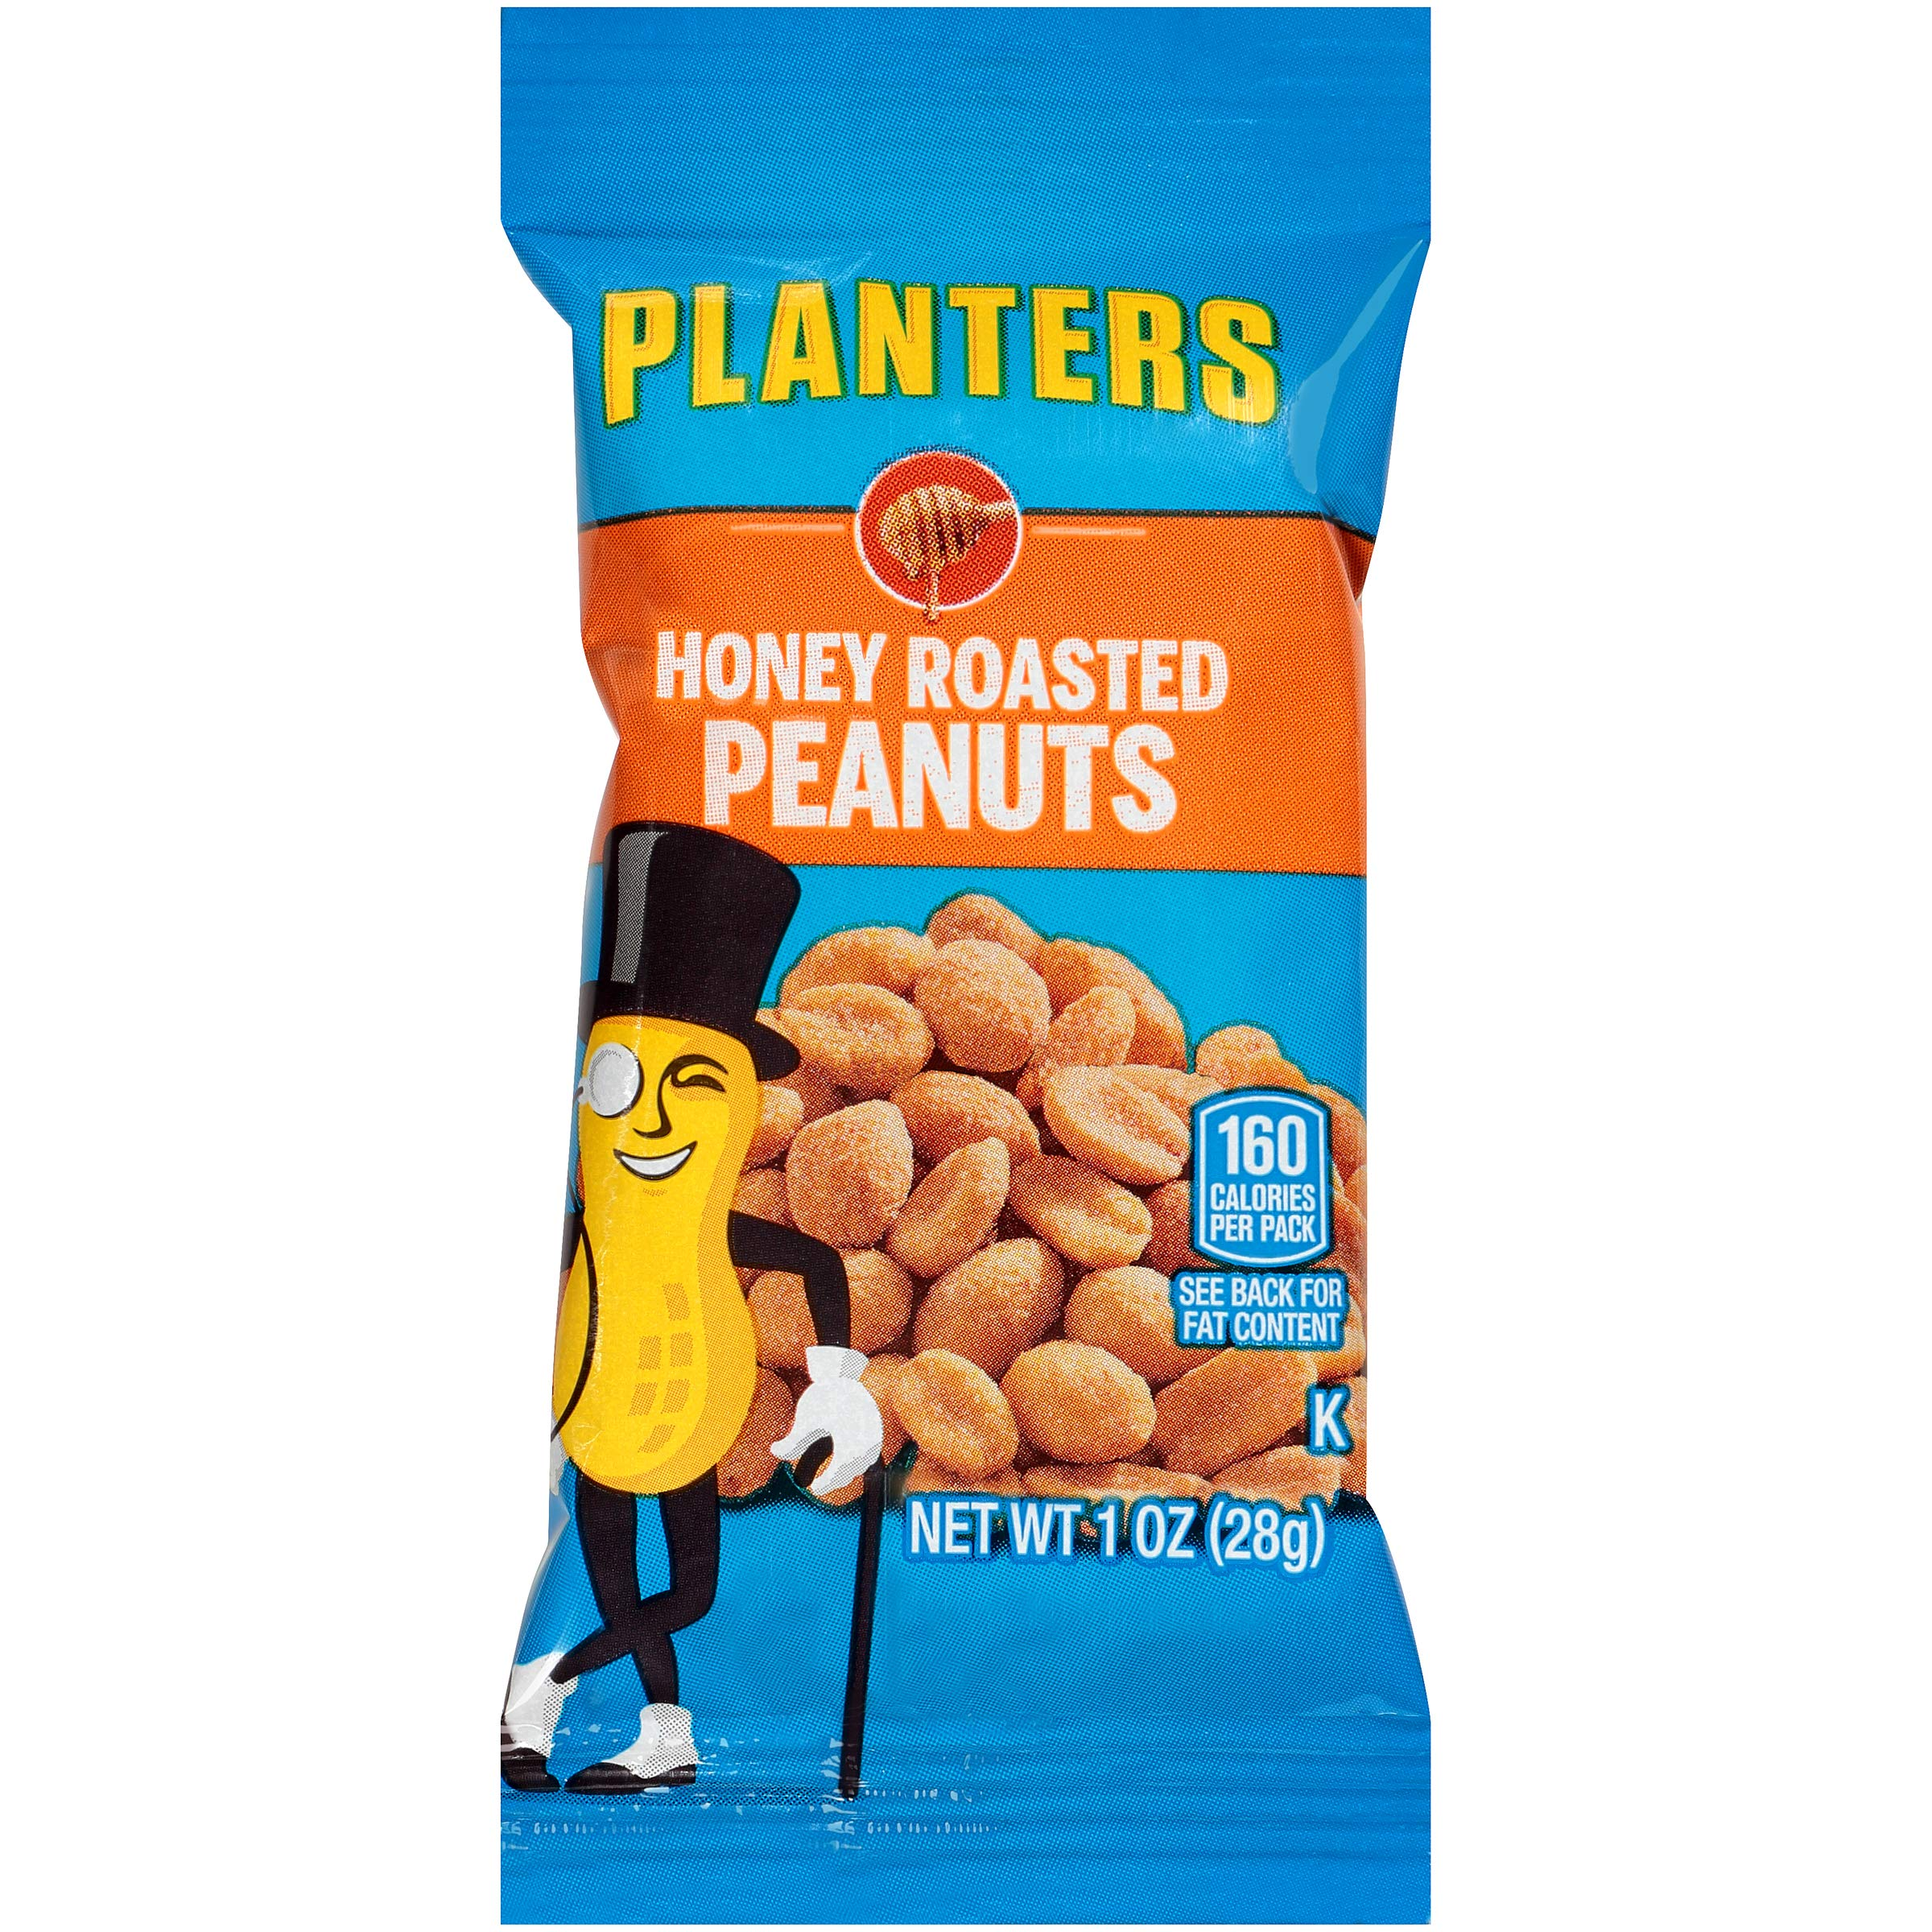 Planters Honey Roasted Peanuts, 1 oz. bag, Pack of 144